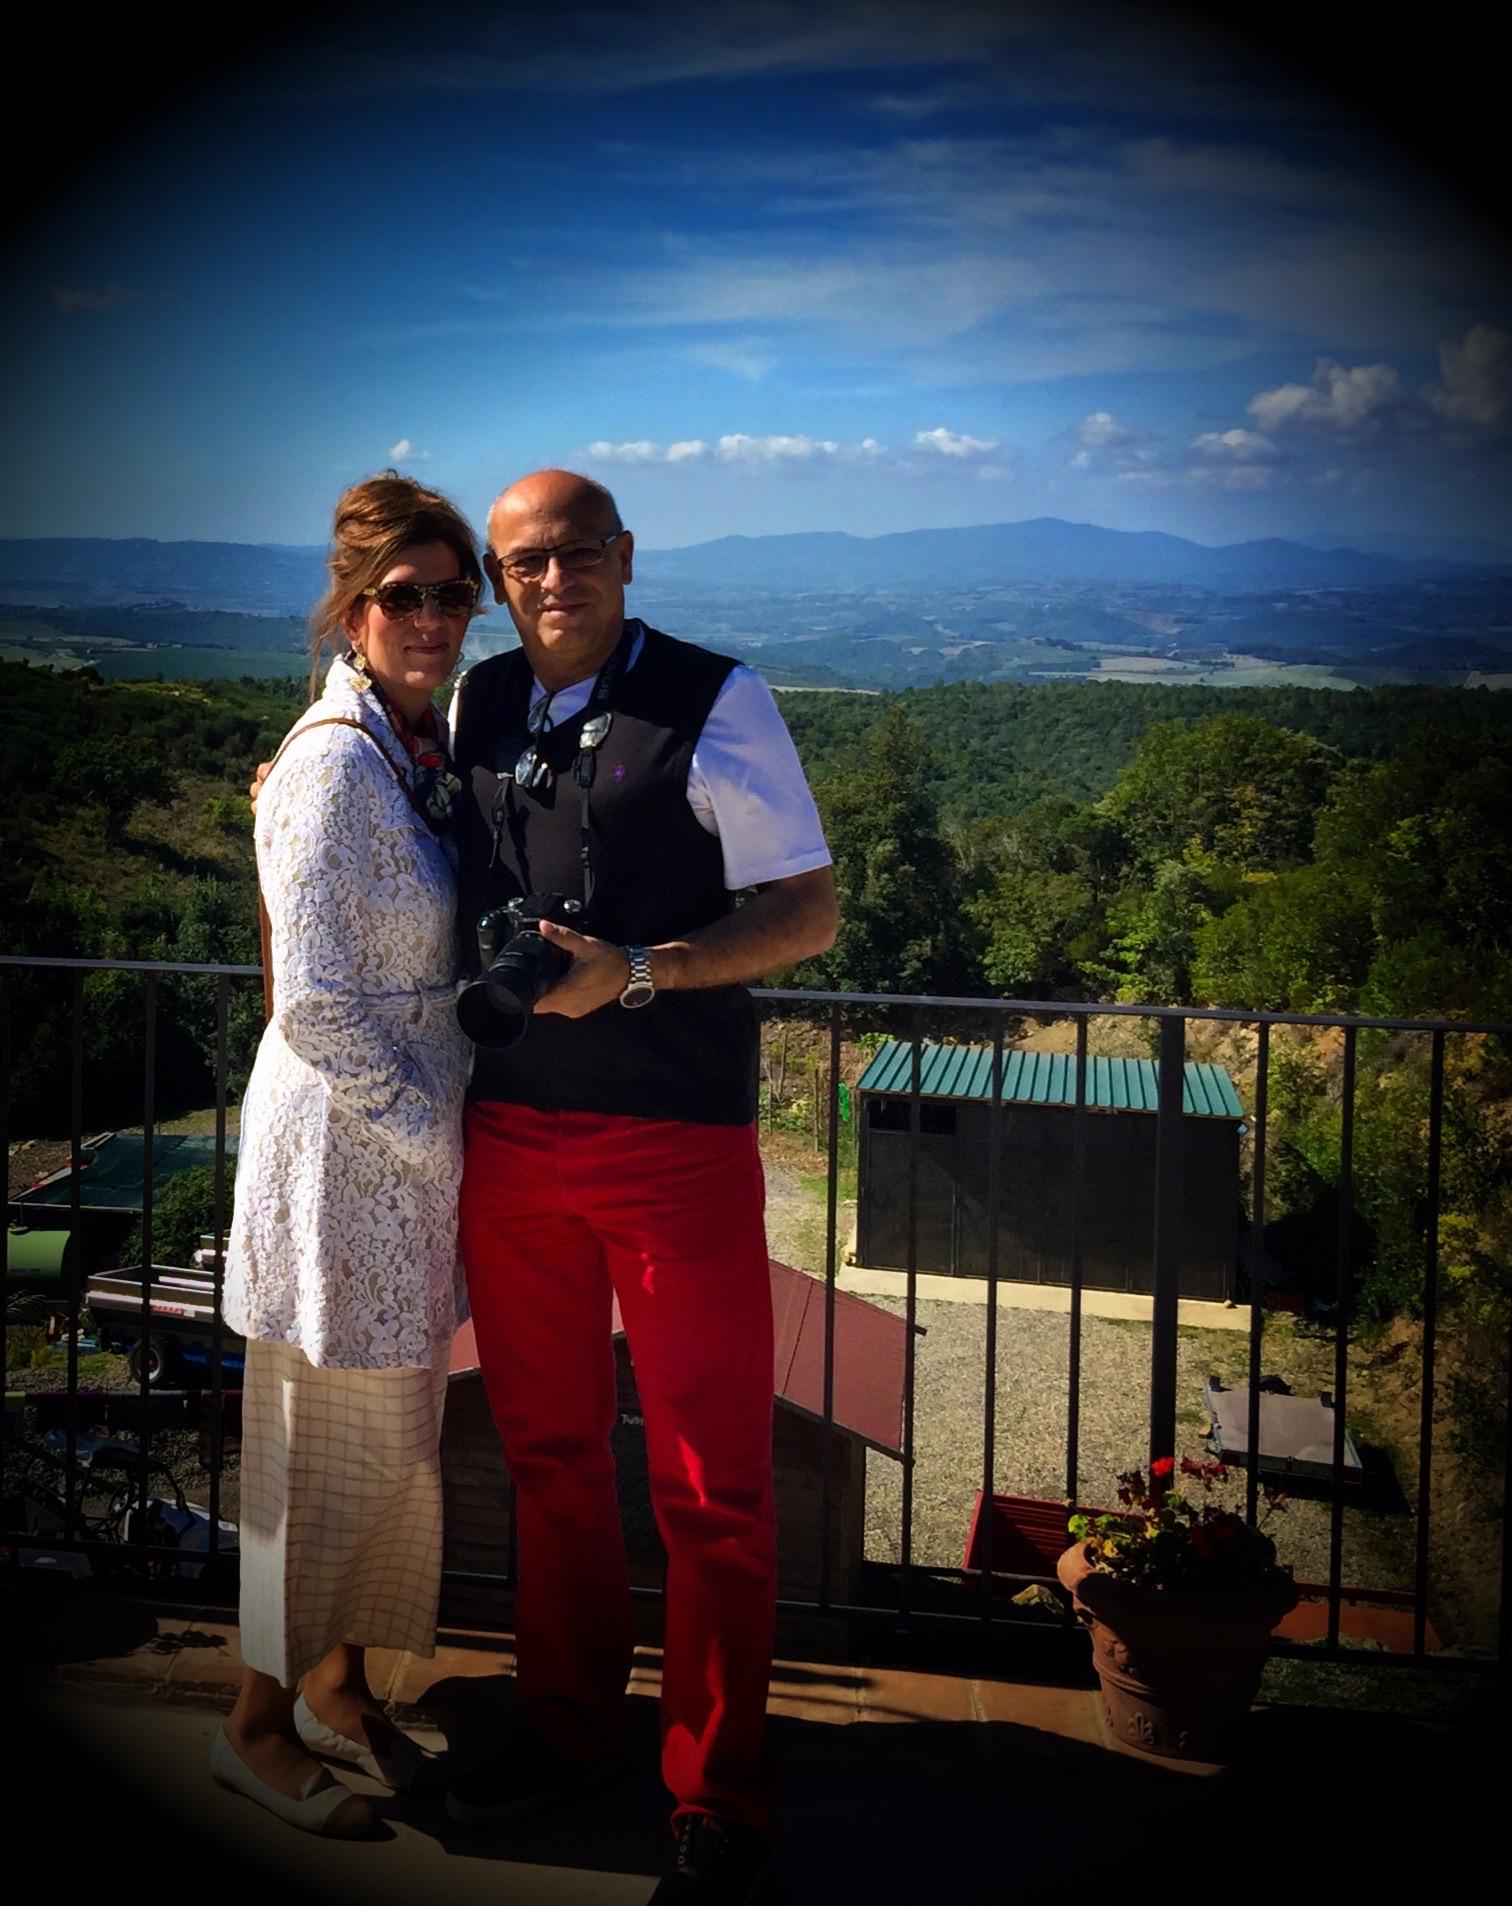 Isabel and Mark at the Poggio Rubino Winery - Montalcino, Tuscany Sept 2015